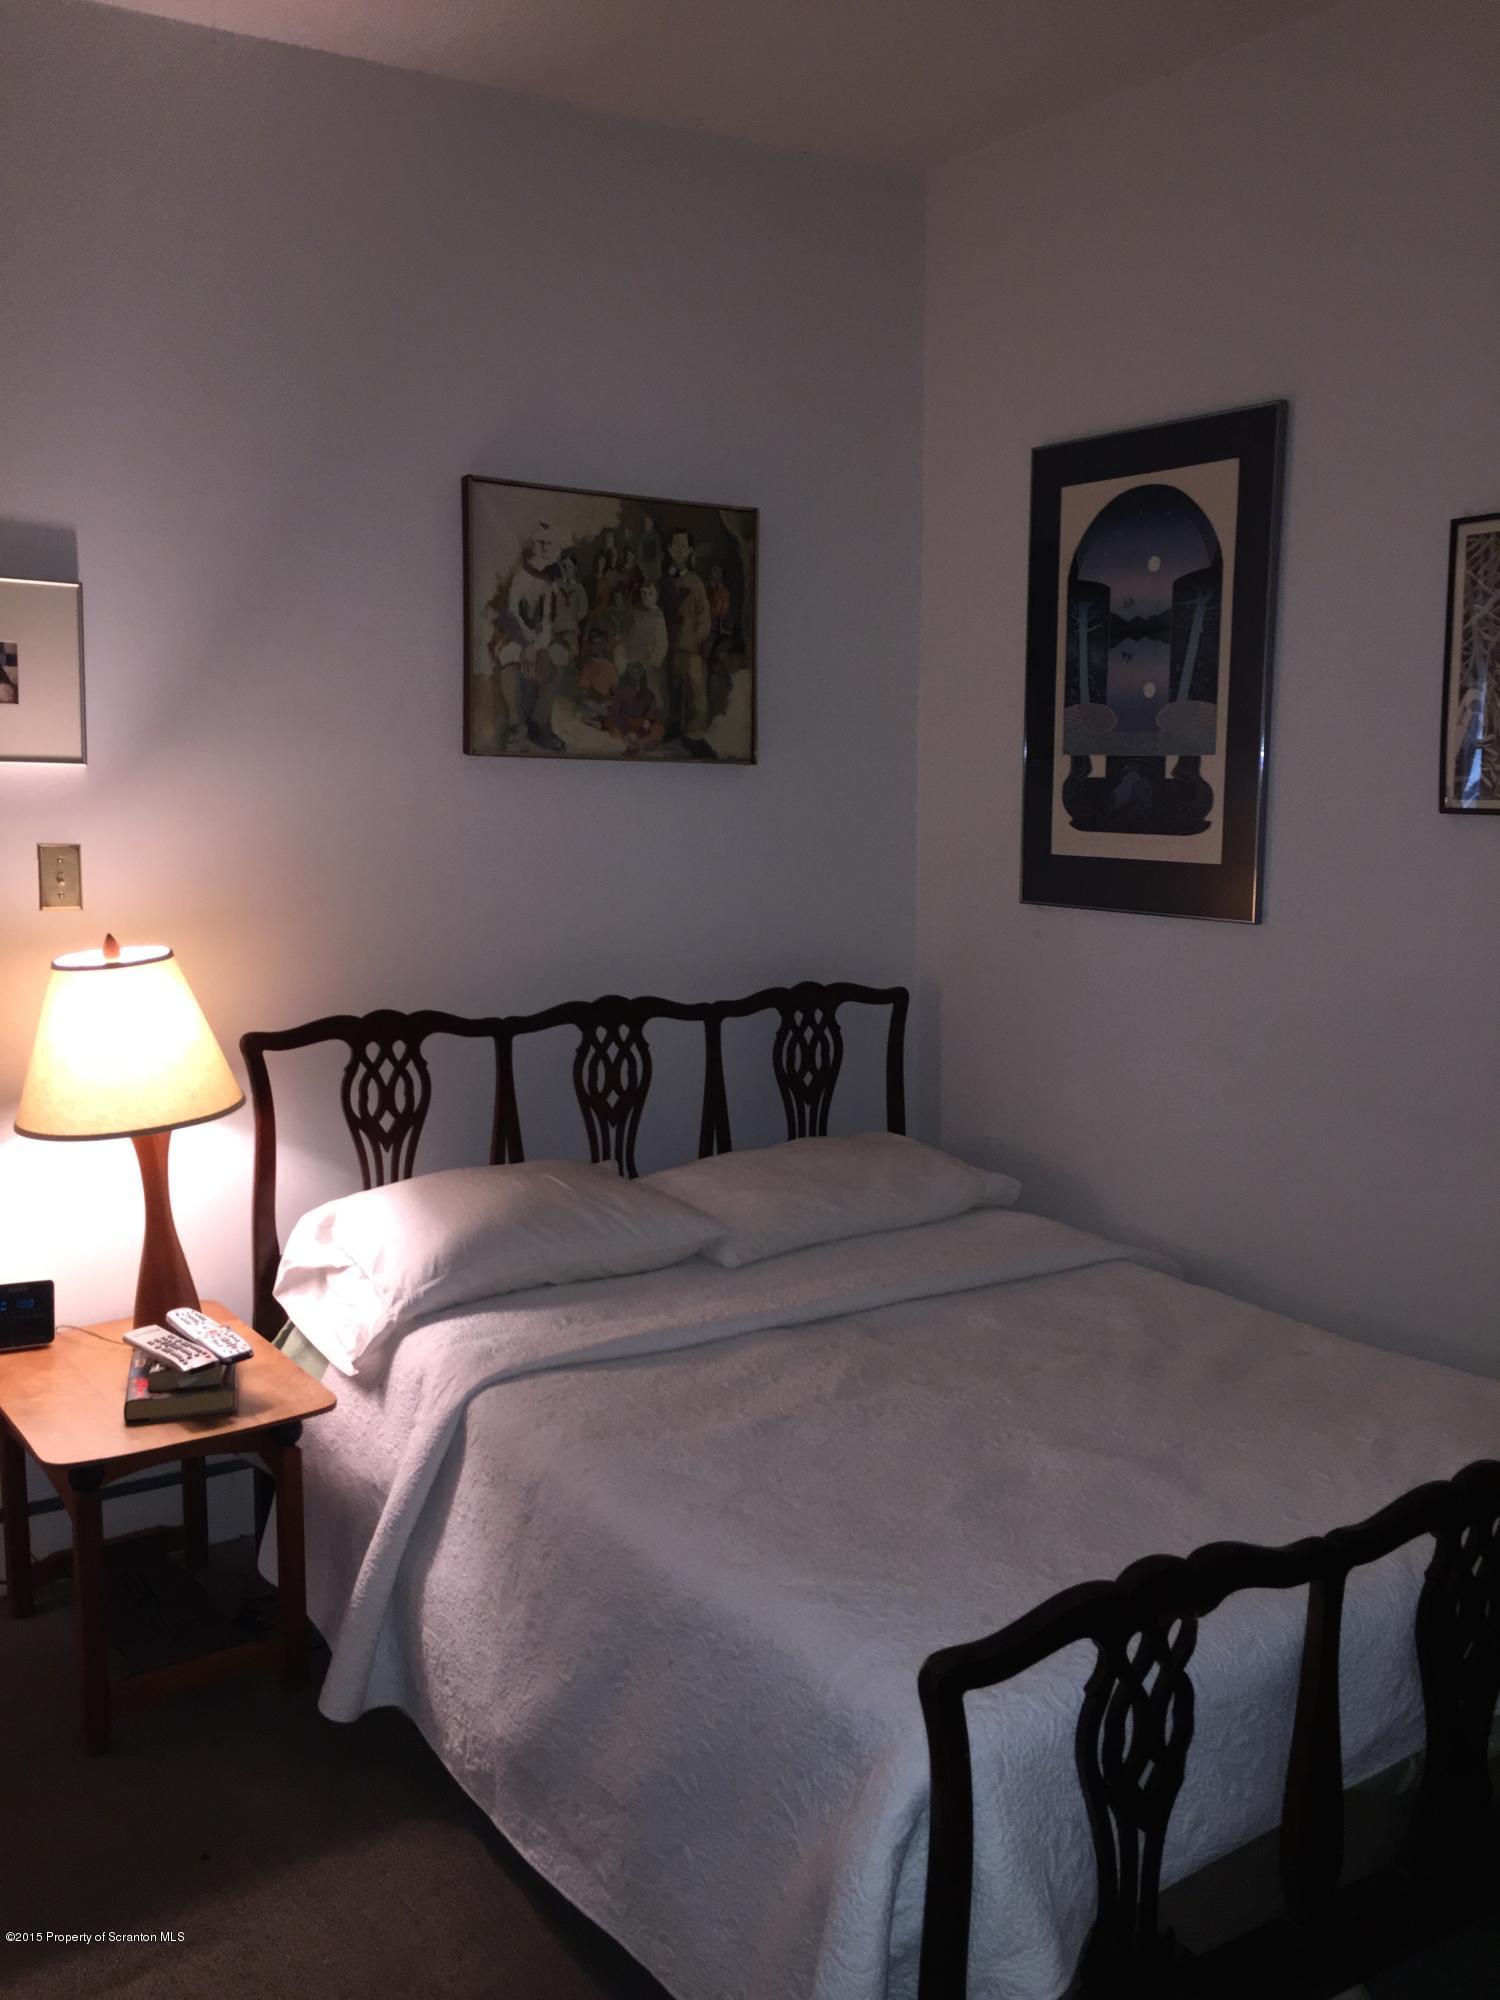 408 SPRUCE ST, Scranton, Pennsylvania 18503, ,3 BathroomsBathrooms,Commercial,For Sale,SPRUCE,15-1578